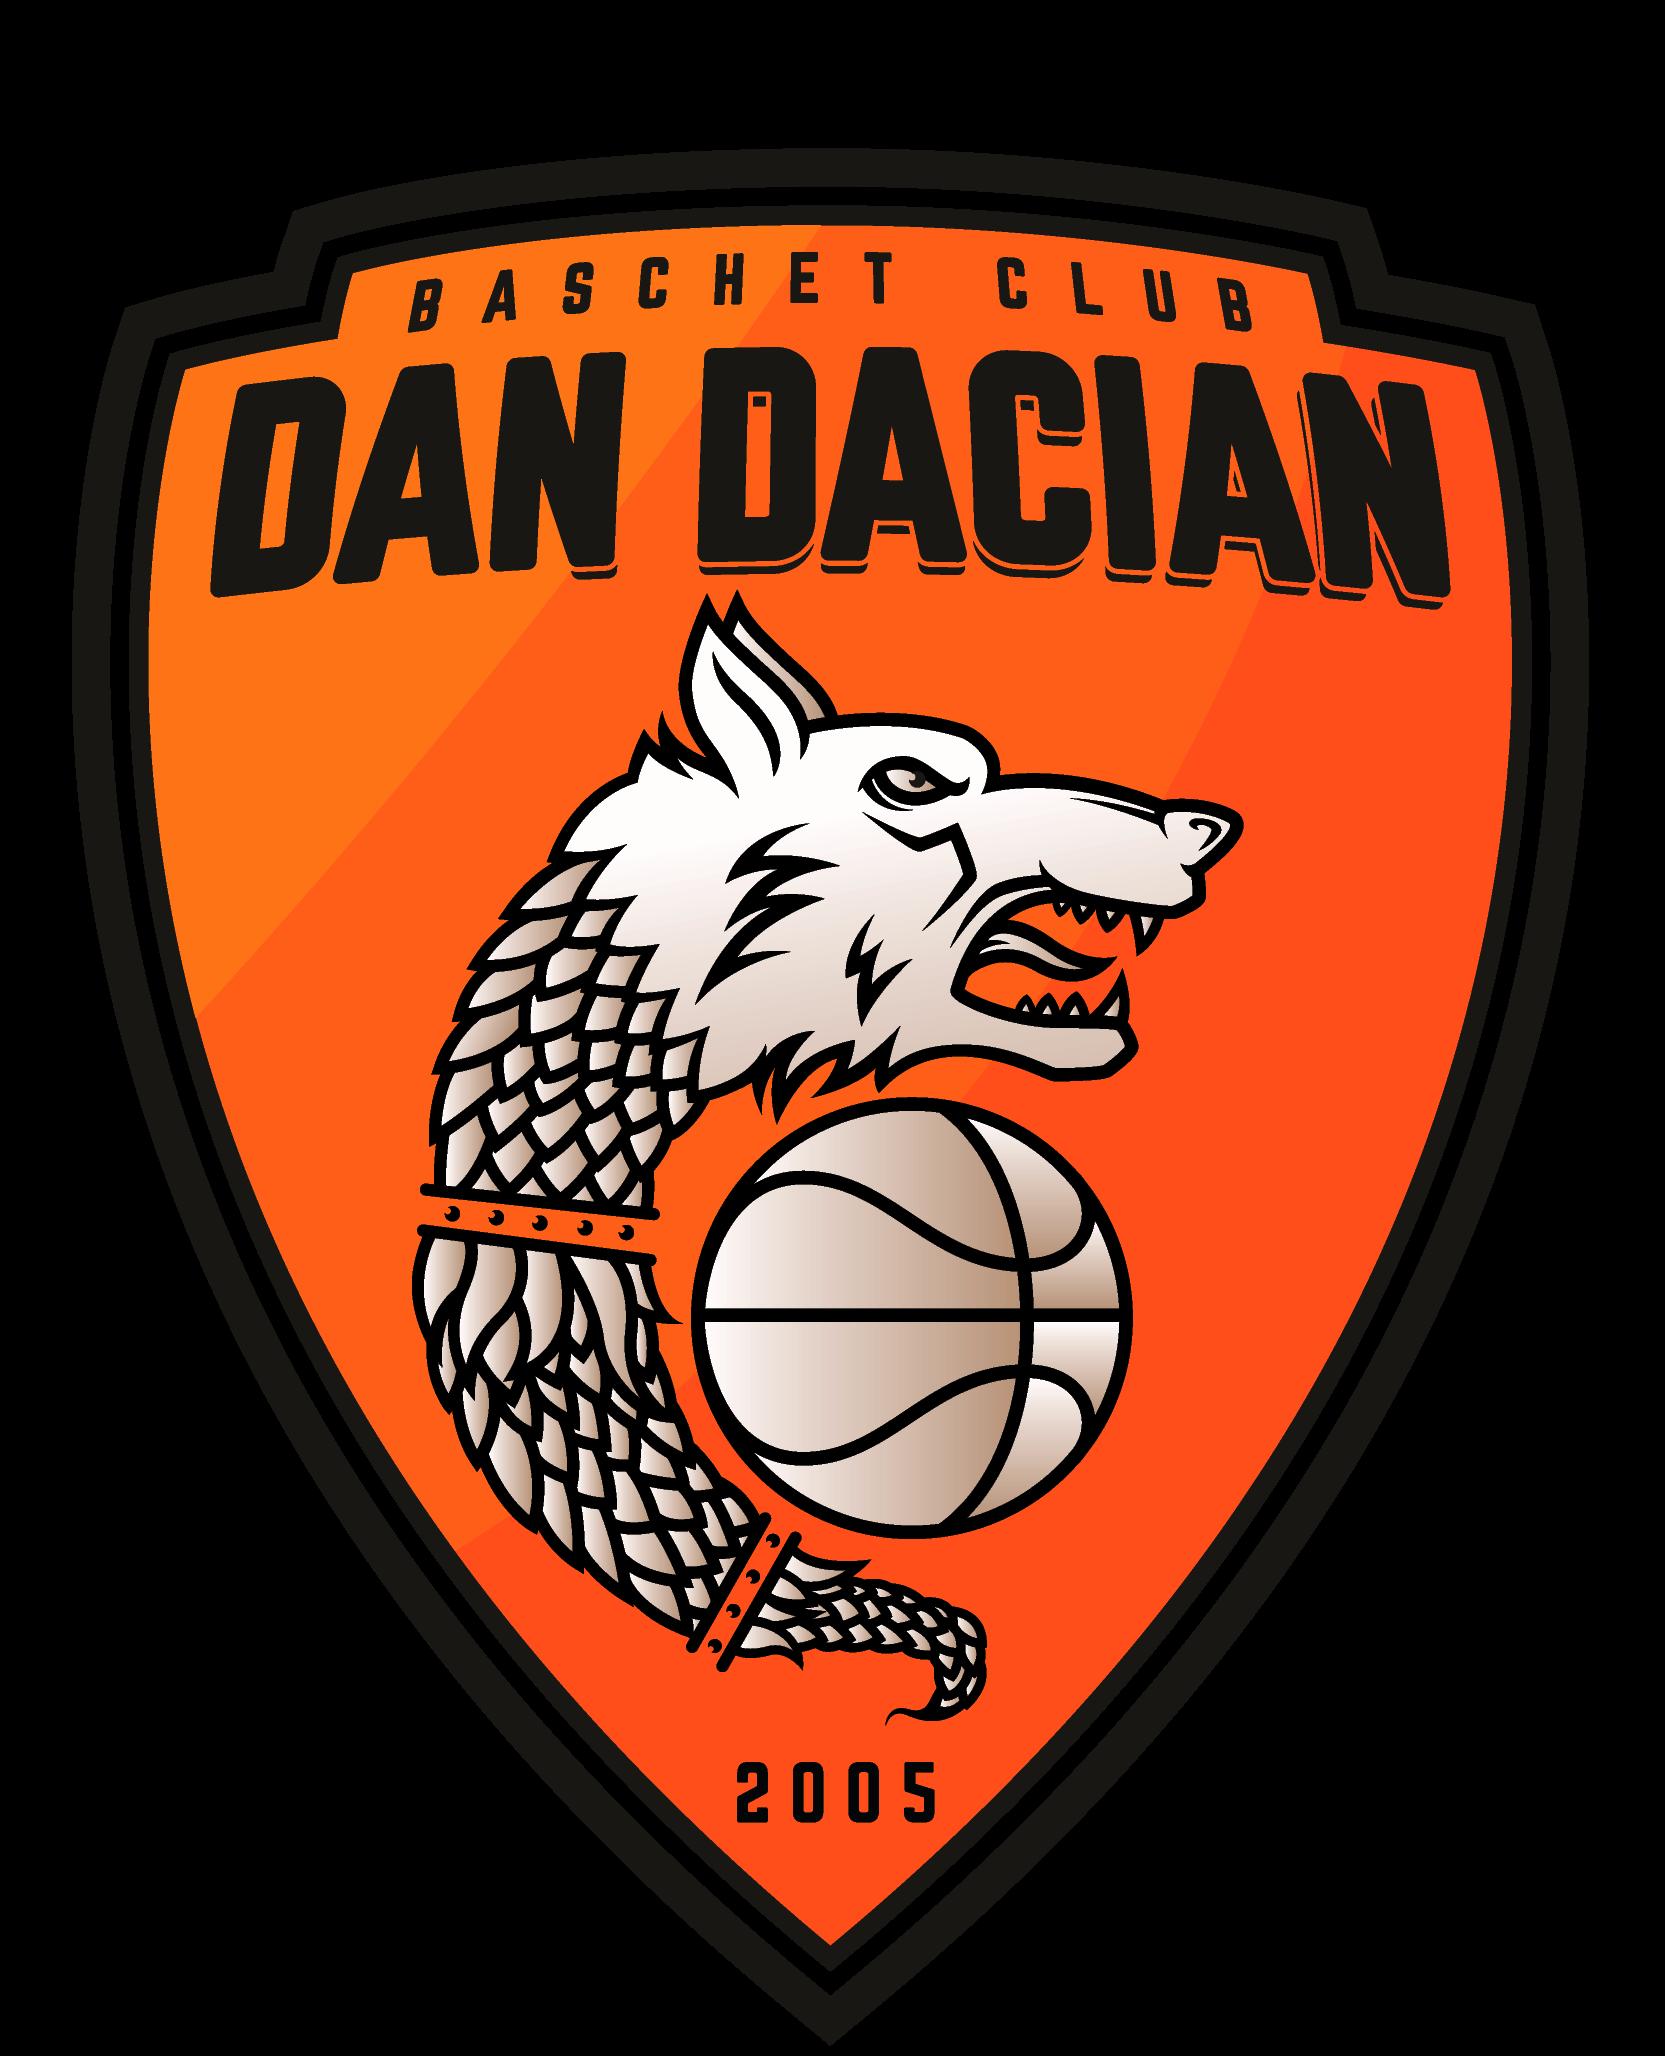 Baschet Club Dan Dacian